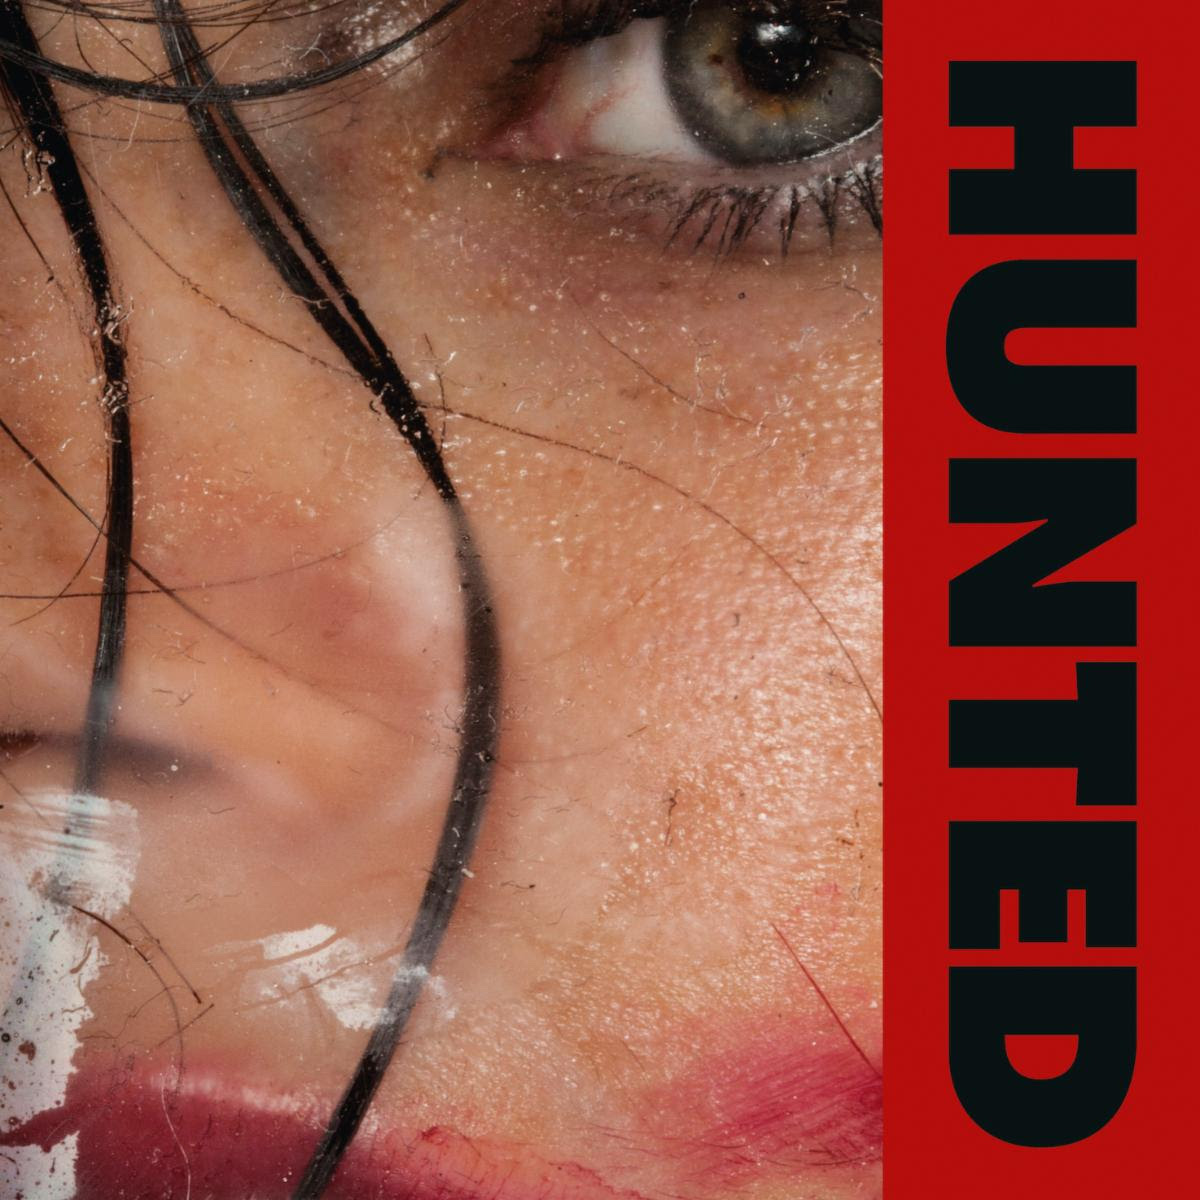 Anna Calvi hunted hunter new album album cover artwork